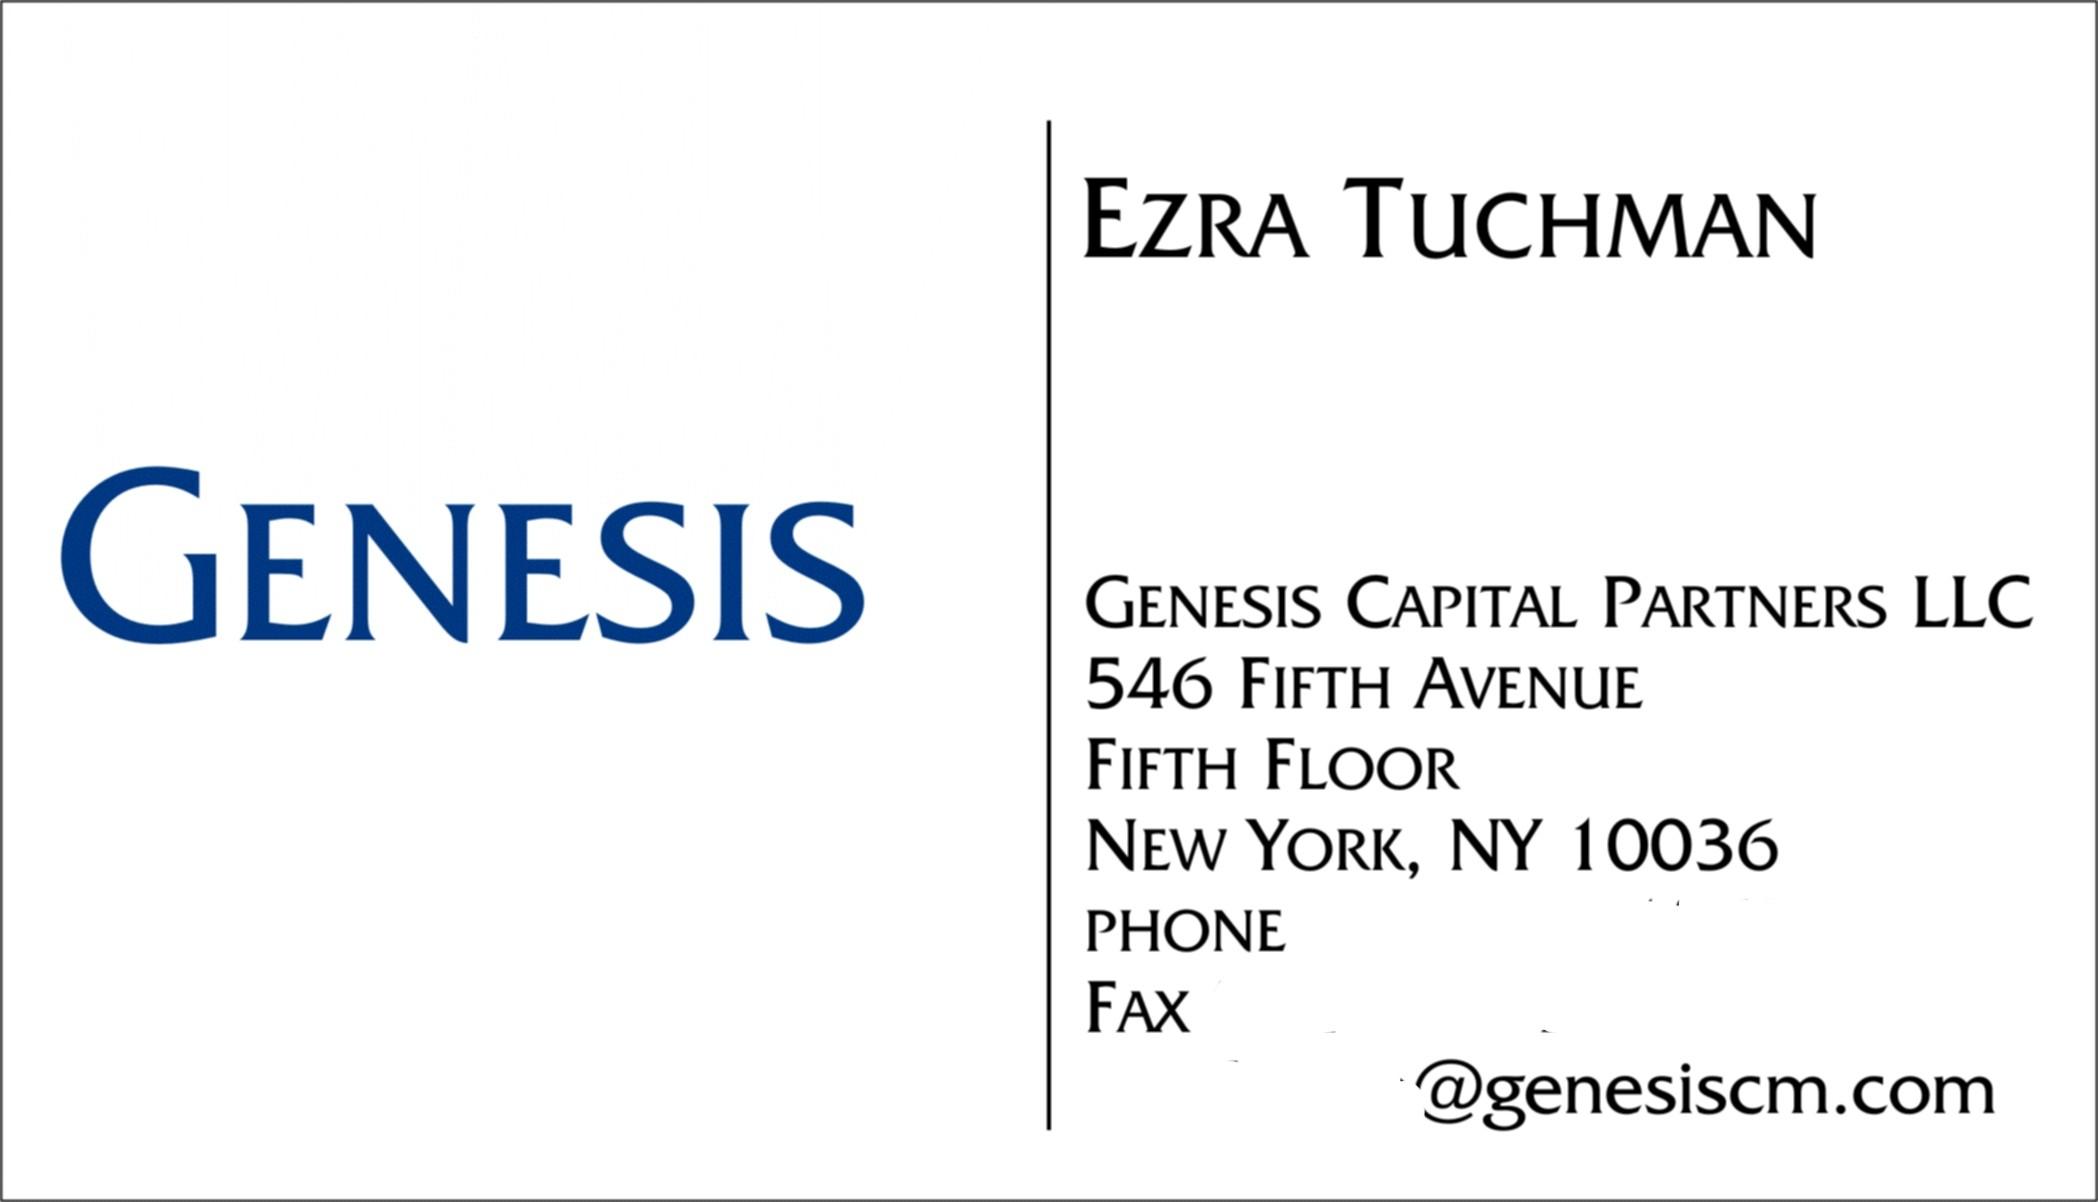 tuchman_business_card_wiped.JPG